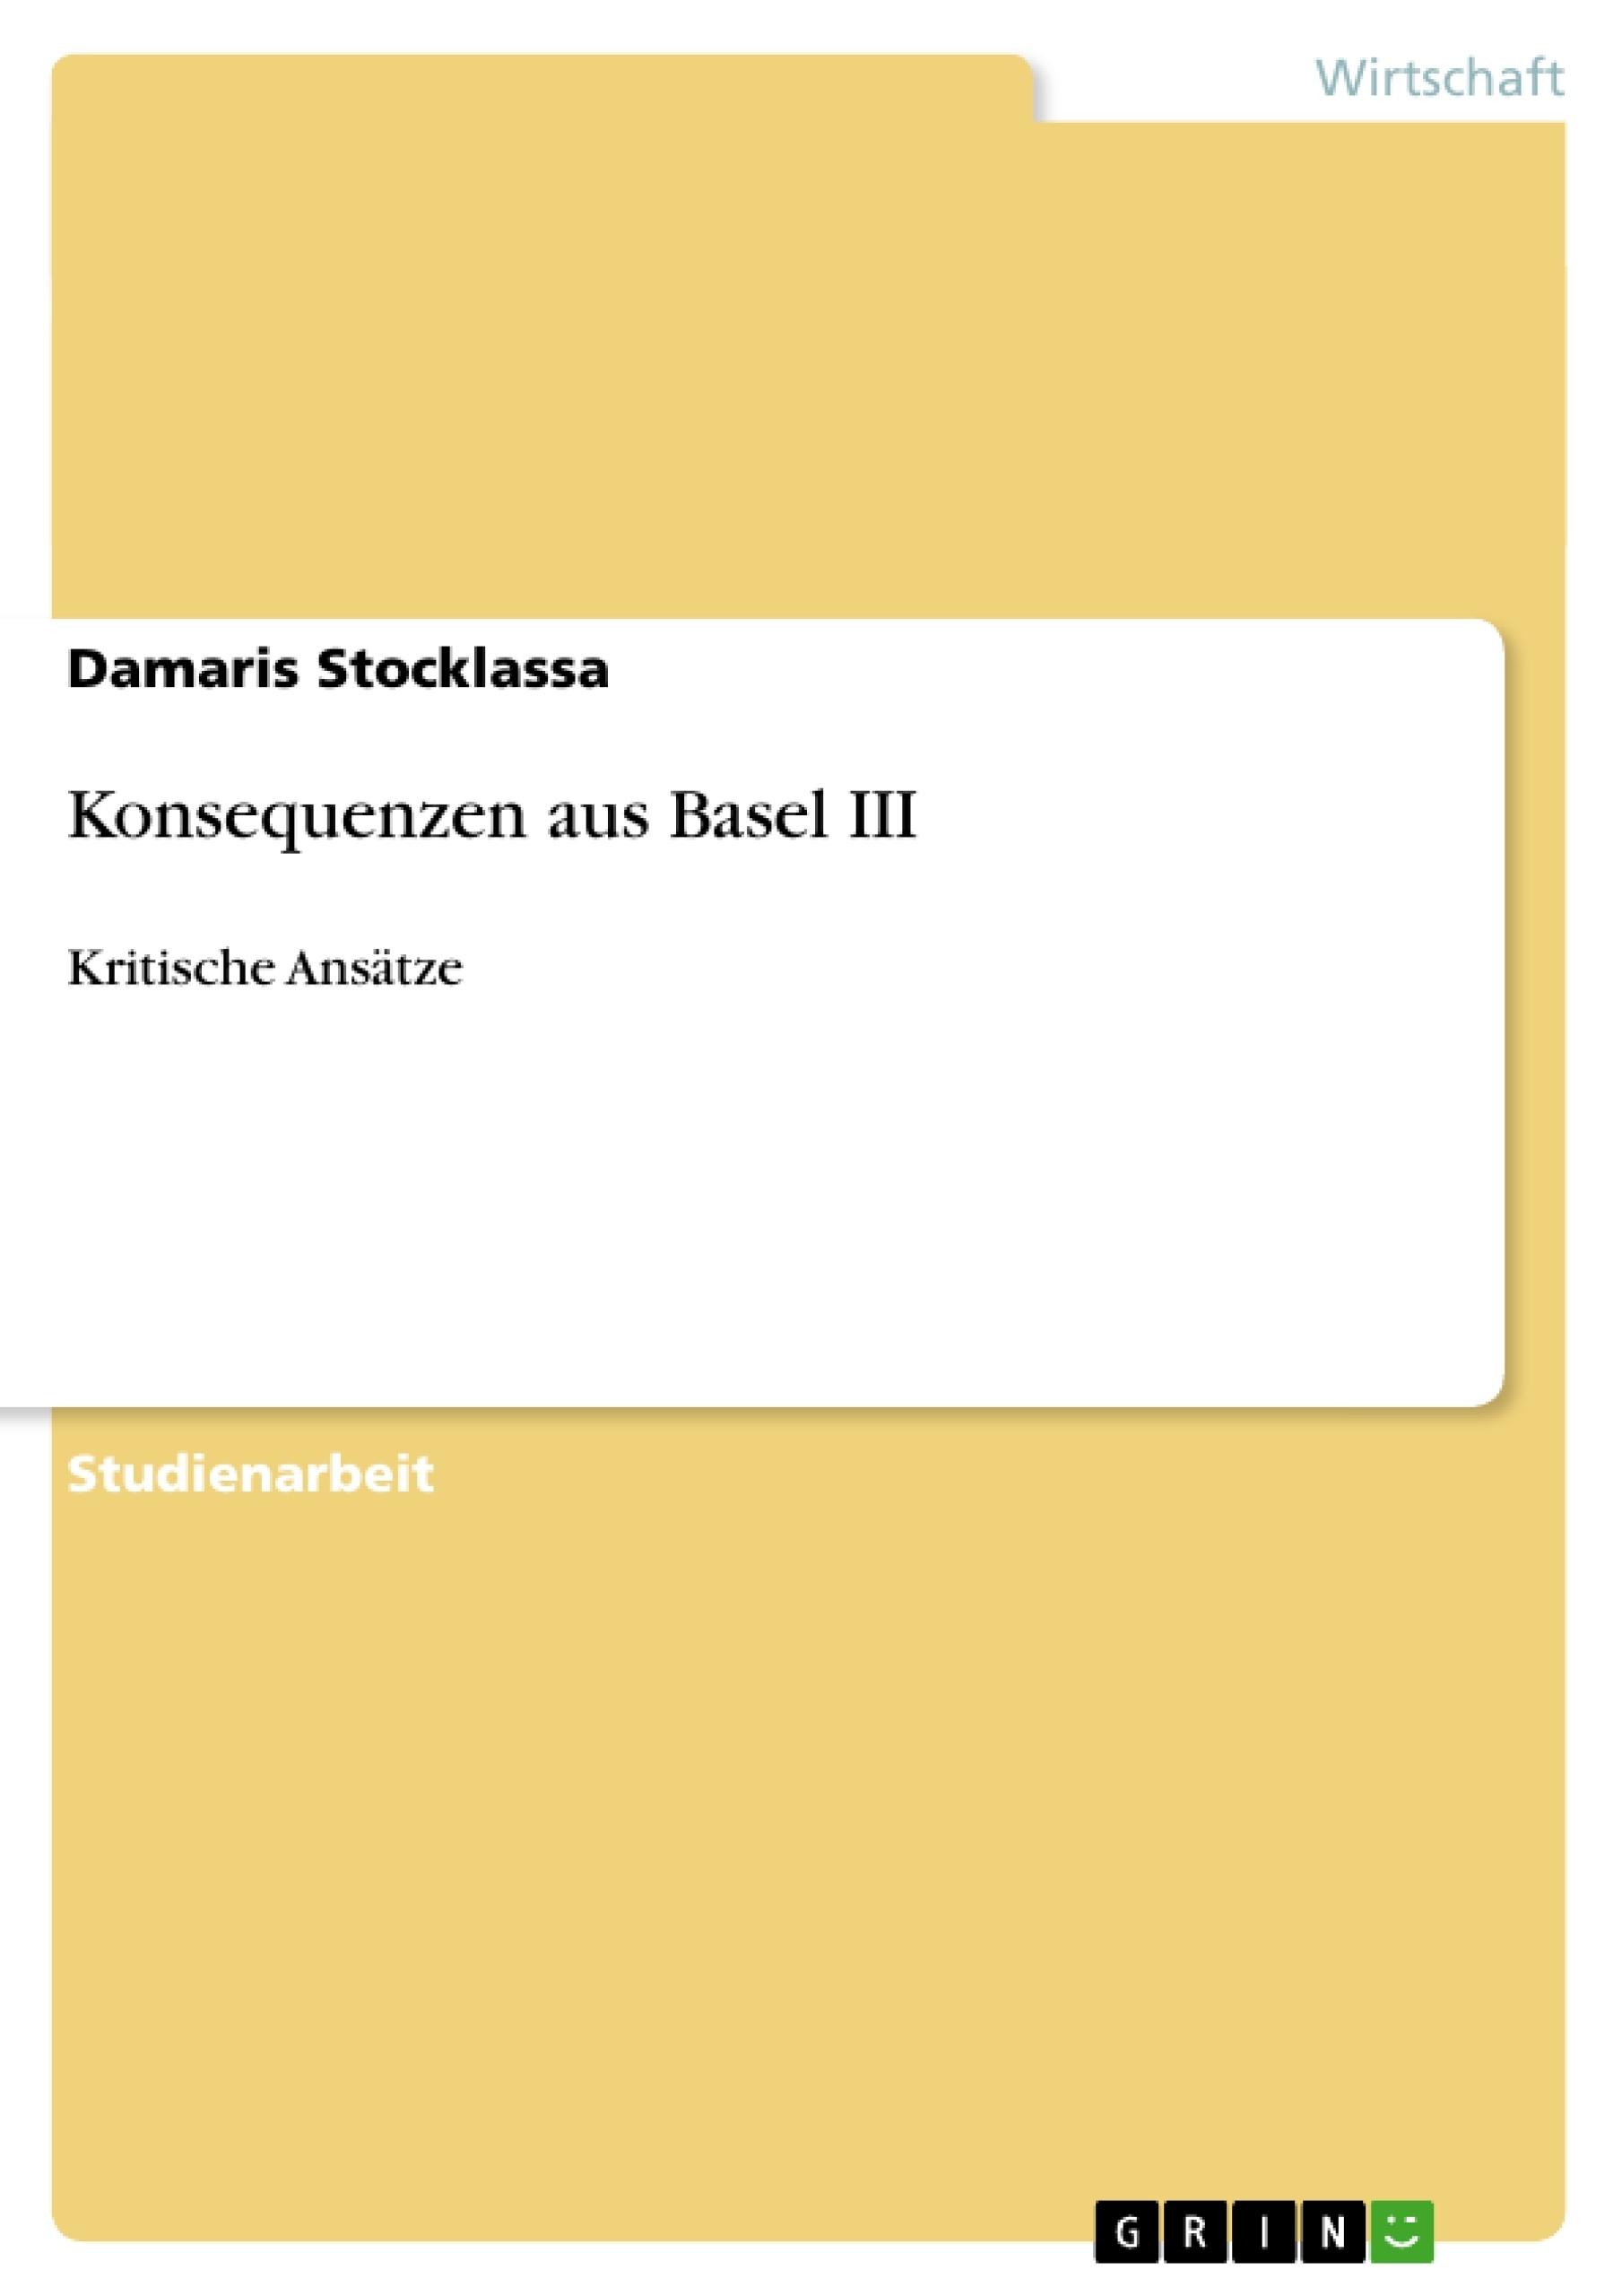 Titel: Konsequenzen aus Basel III